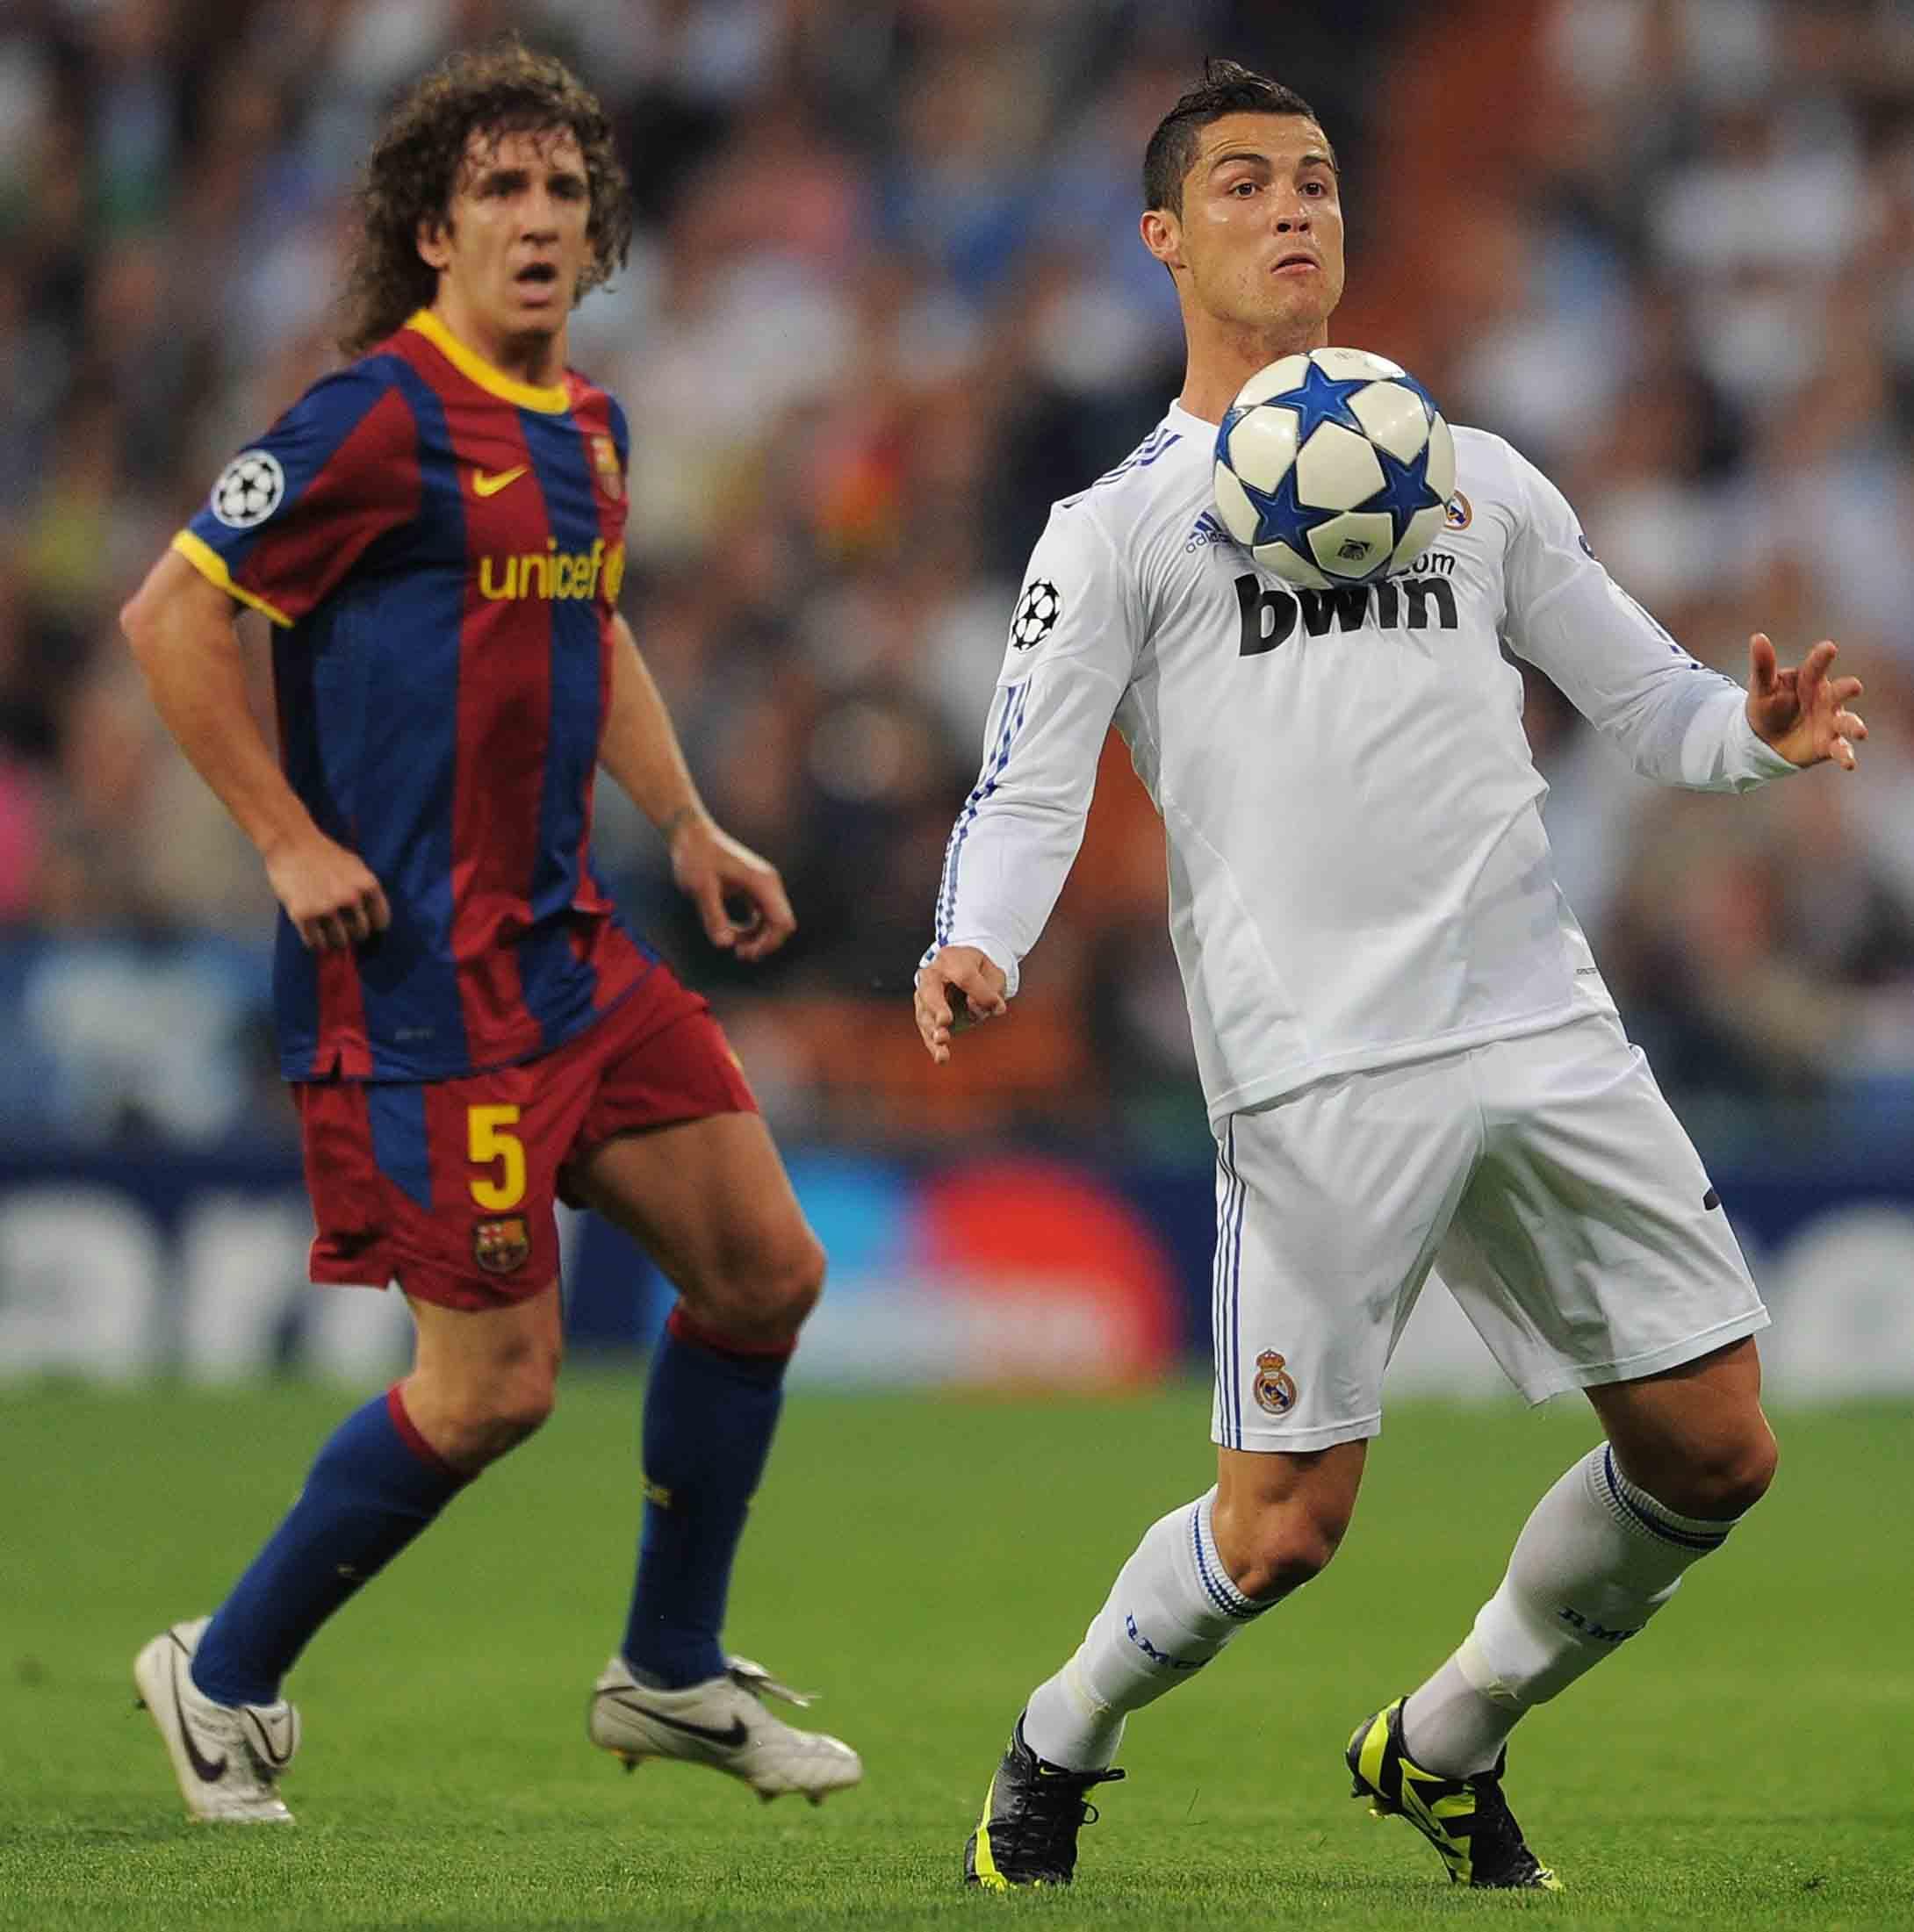 Duelo 1x1. Marcaje Carles Puyol & Cristiano Ronaldo